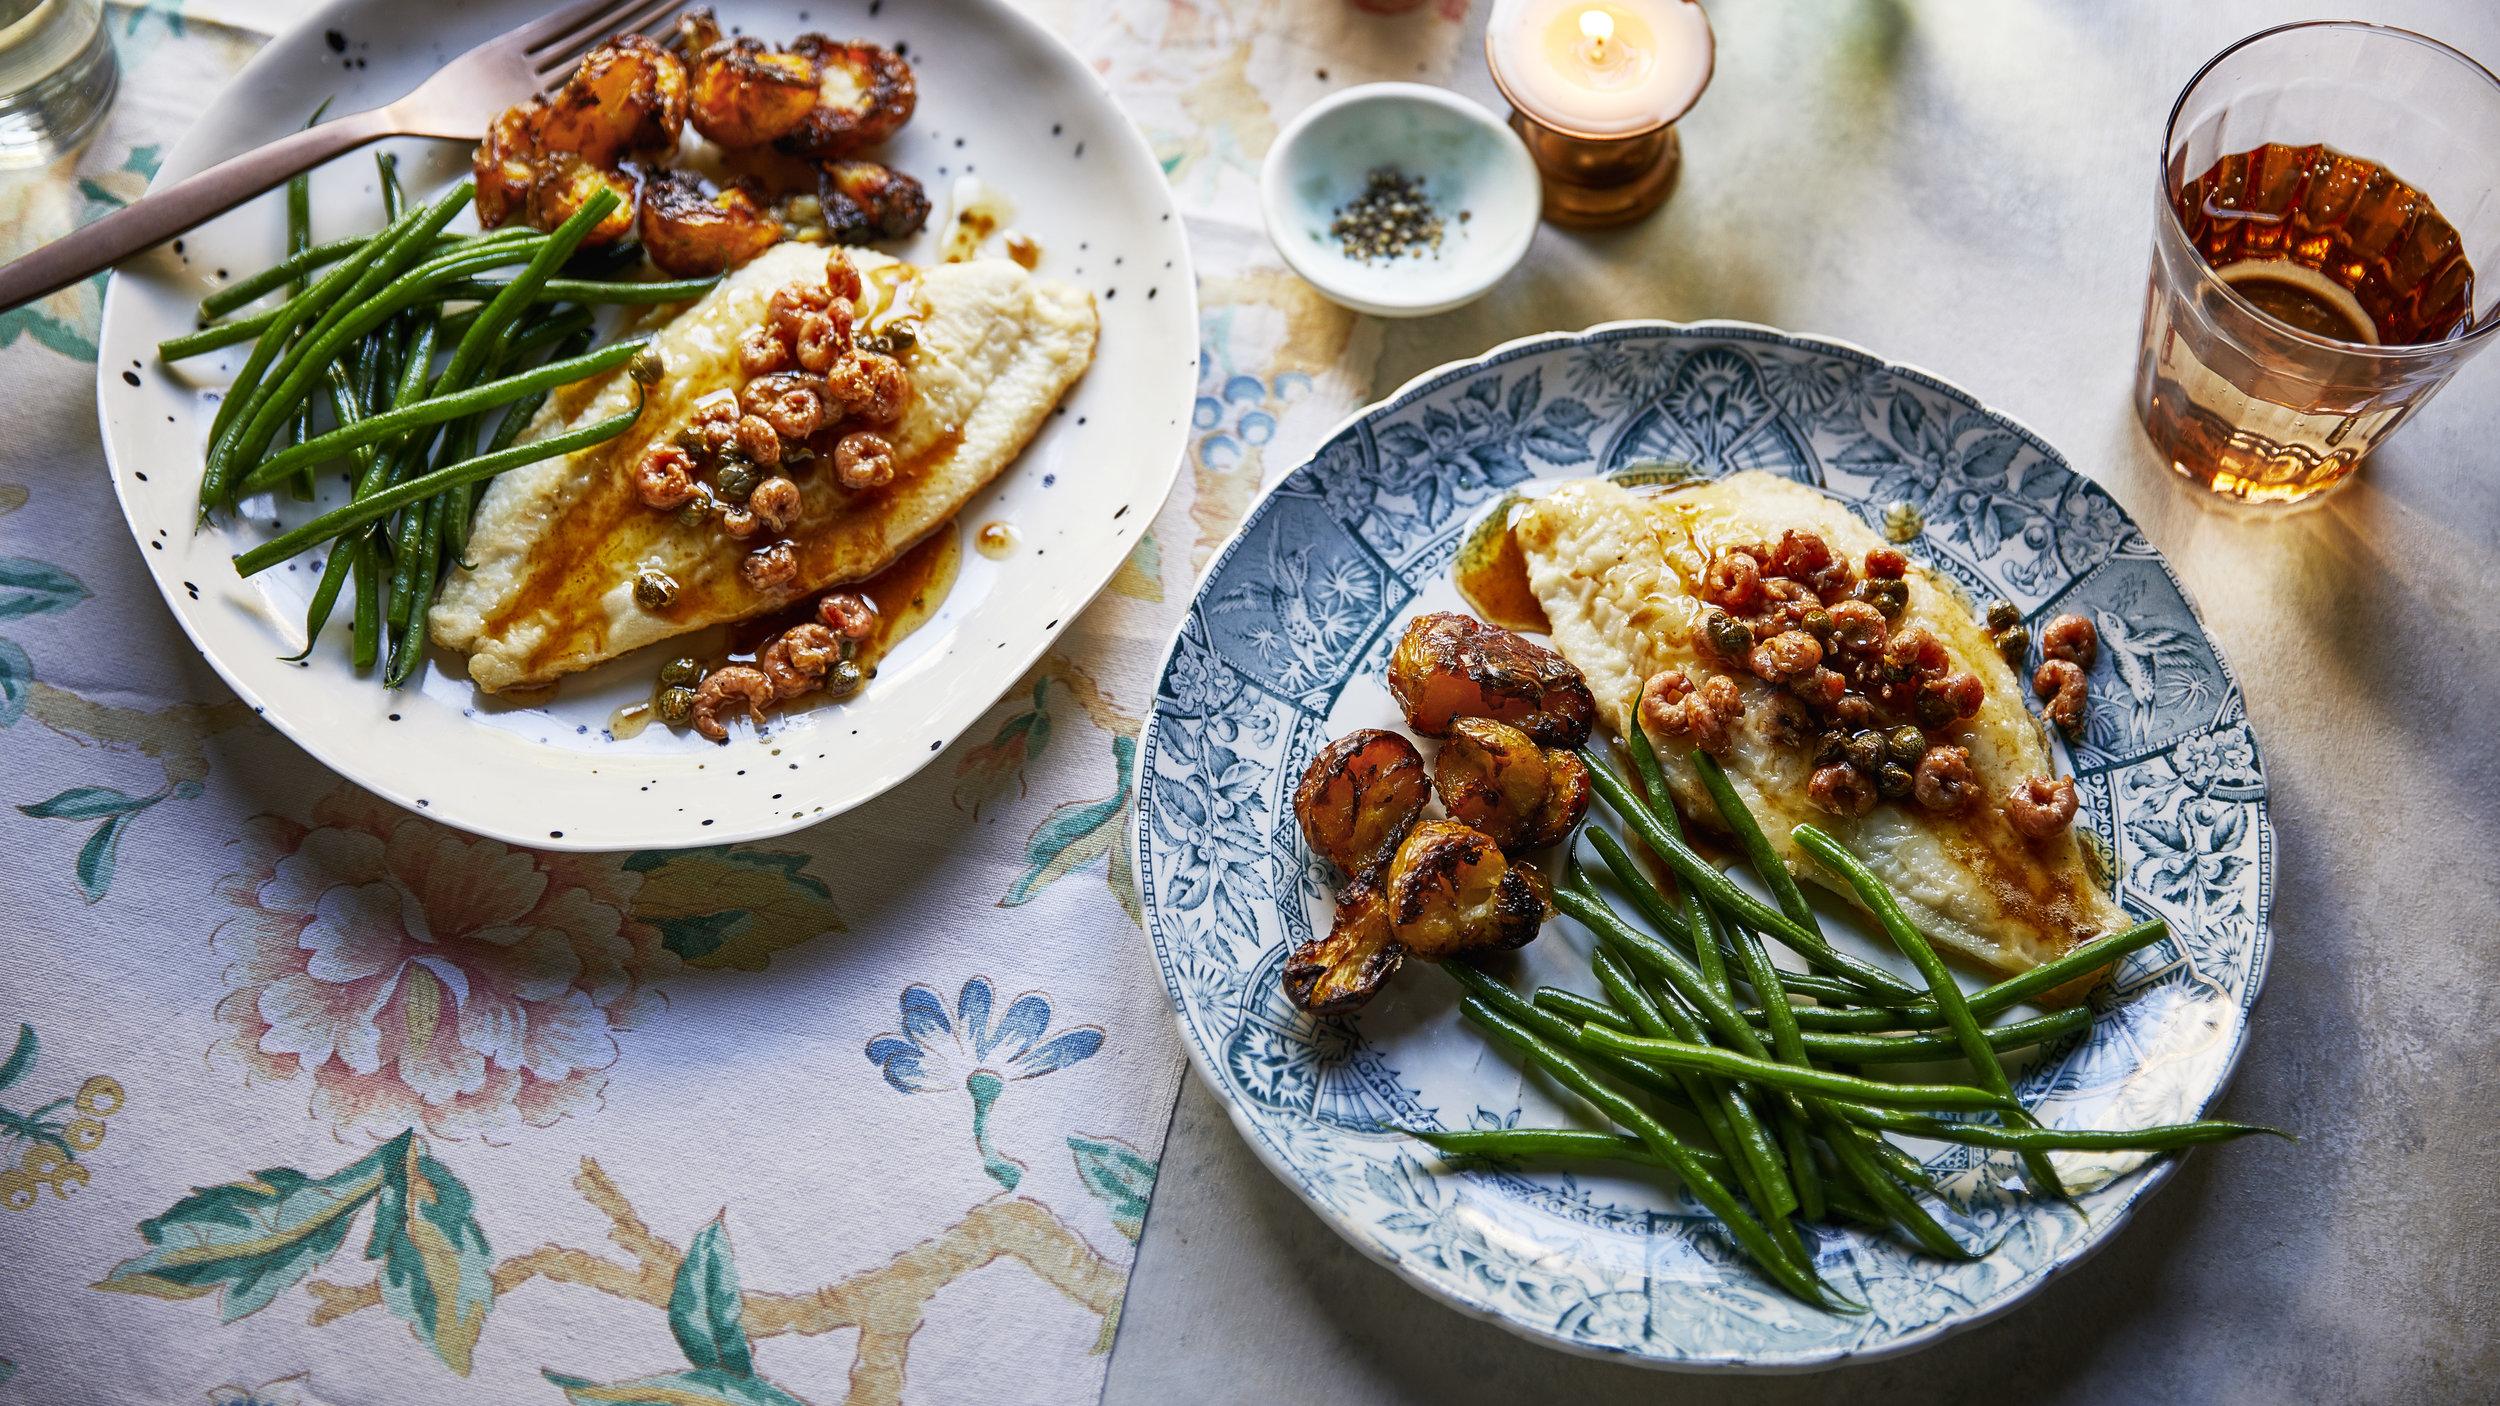 Food Stylist: Nicola Roberts Prop Stylist: Cynthia Blackett